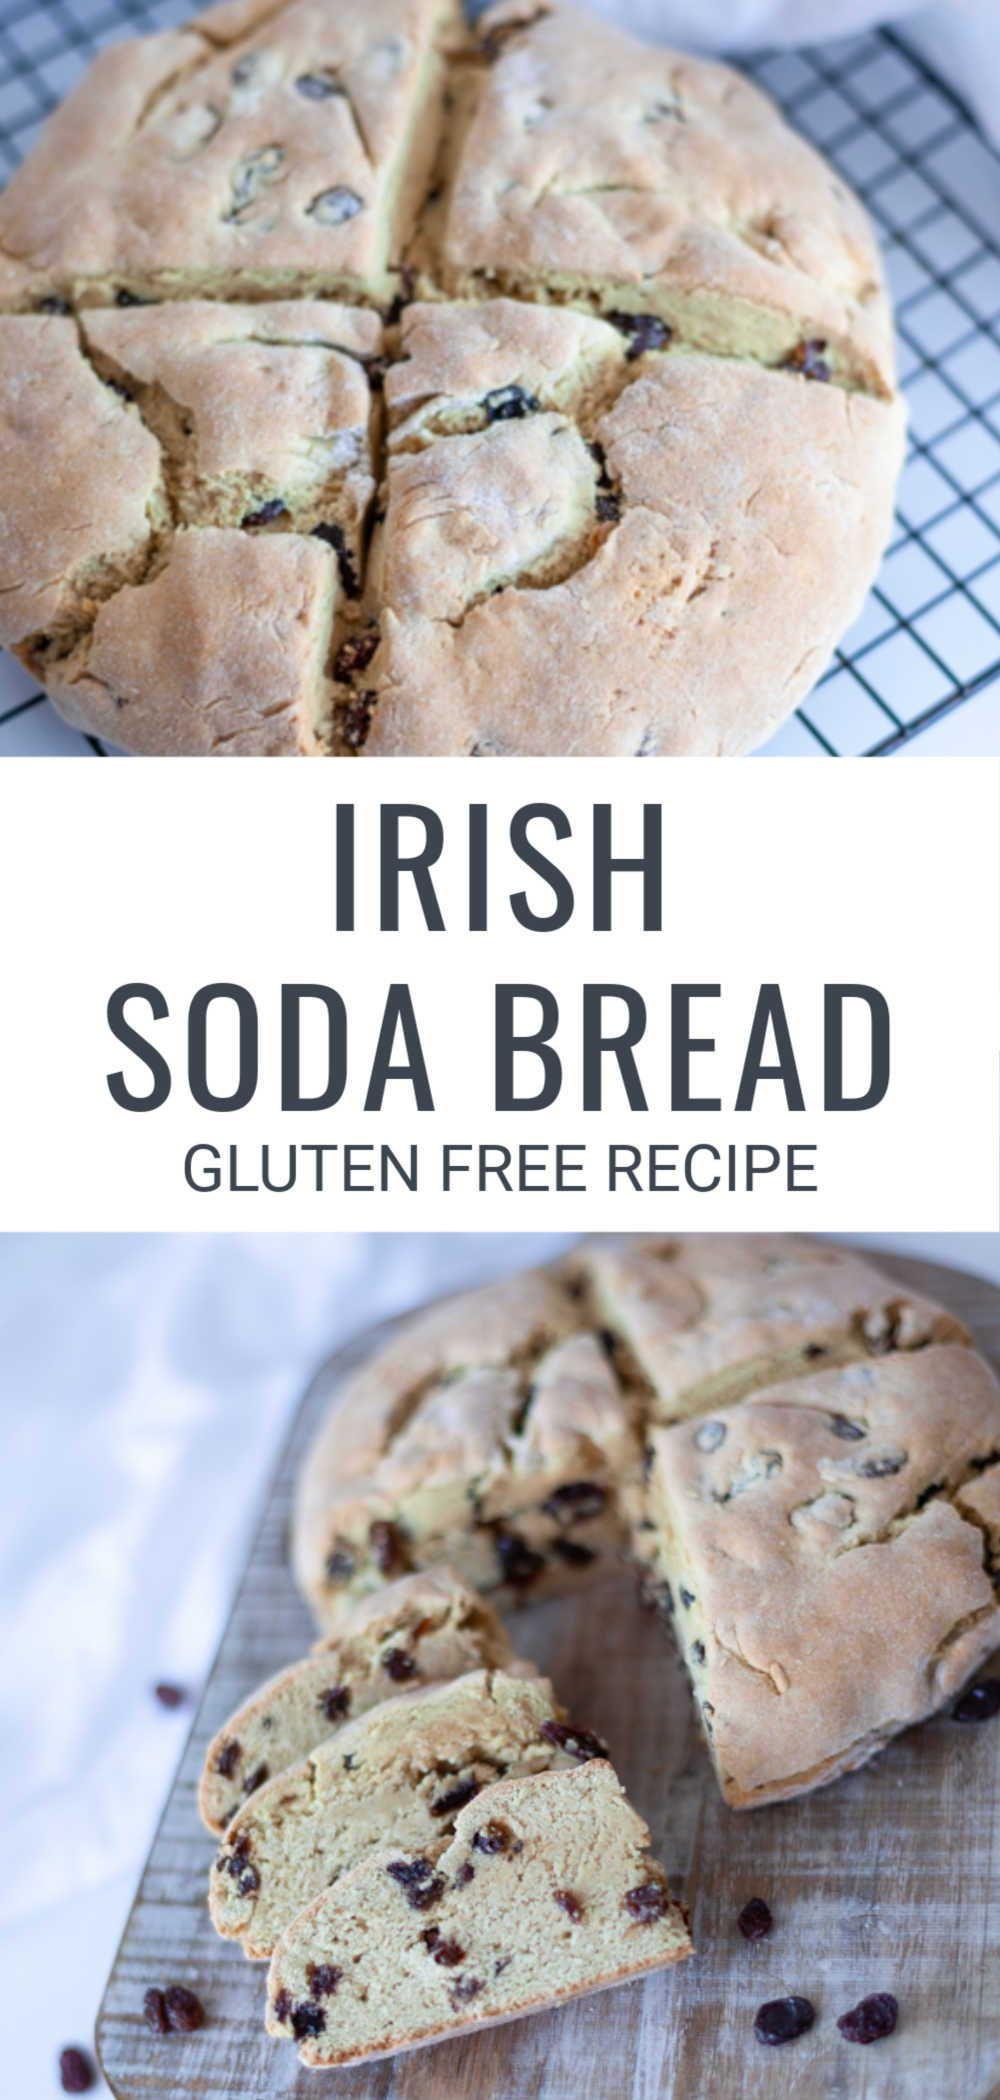 Gluten Free Irish Soda Bread Recipe Gluten Free Irish Soda Bread Recipe Easy Holiday Recipes Soda Bread